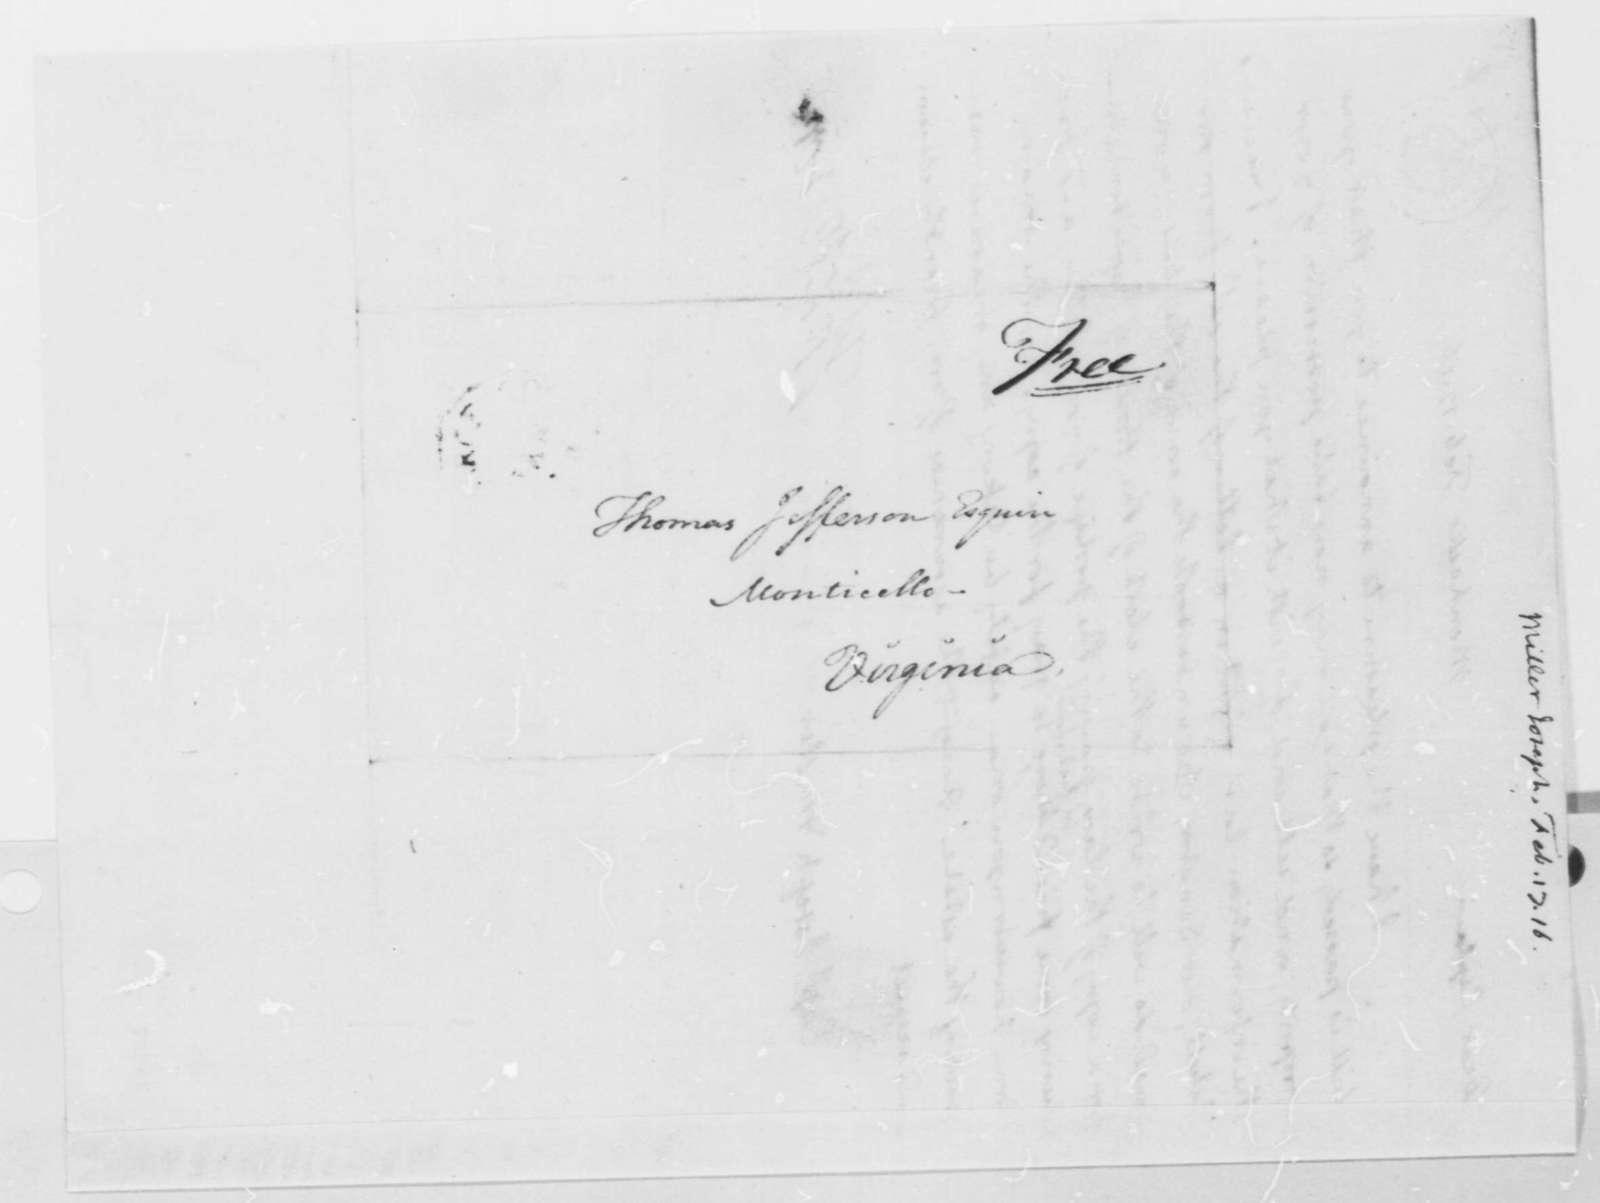 Thomas Jefferson to Joseph Miller, February 17, 1816